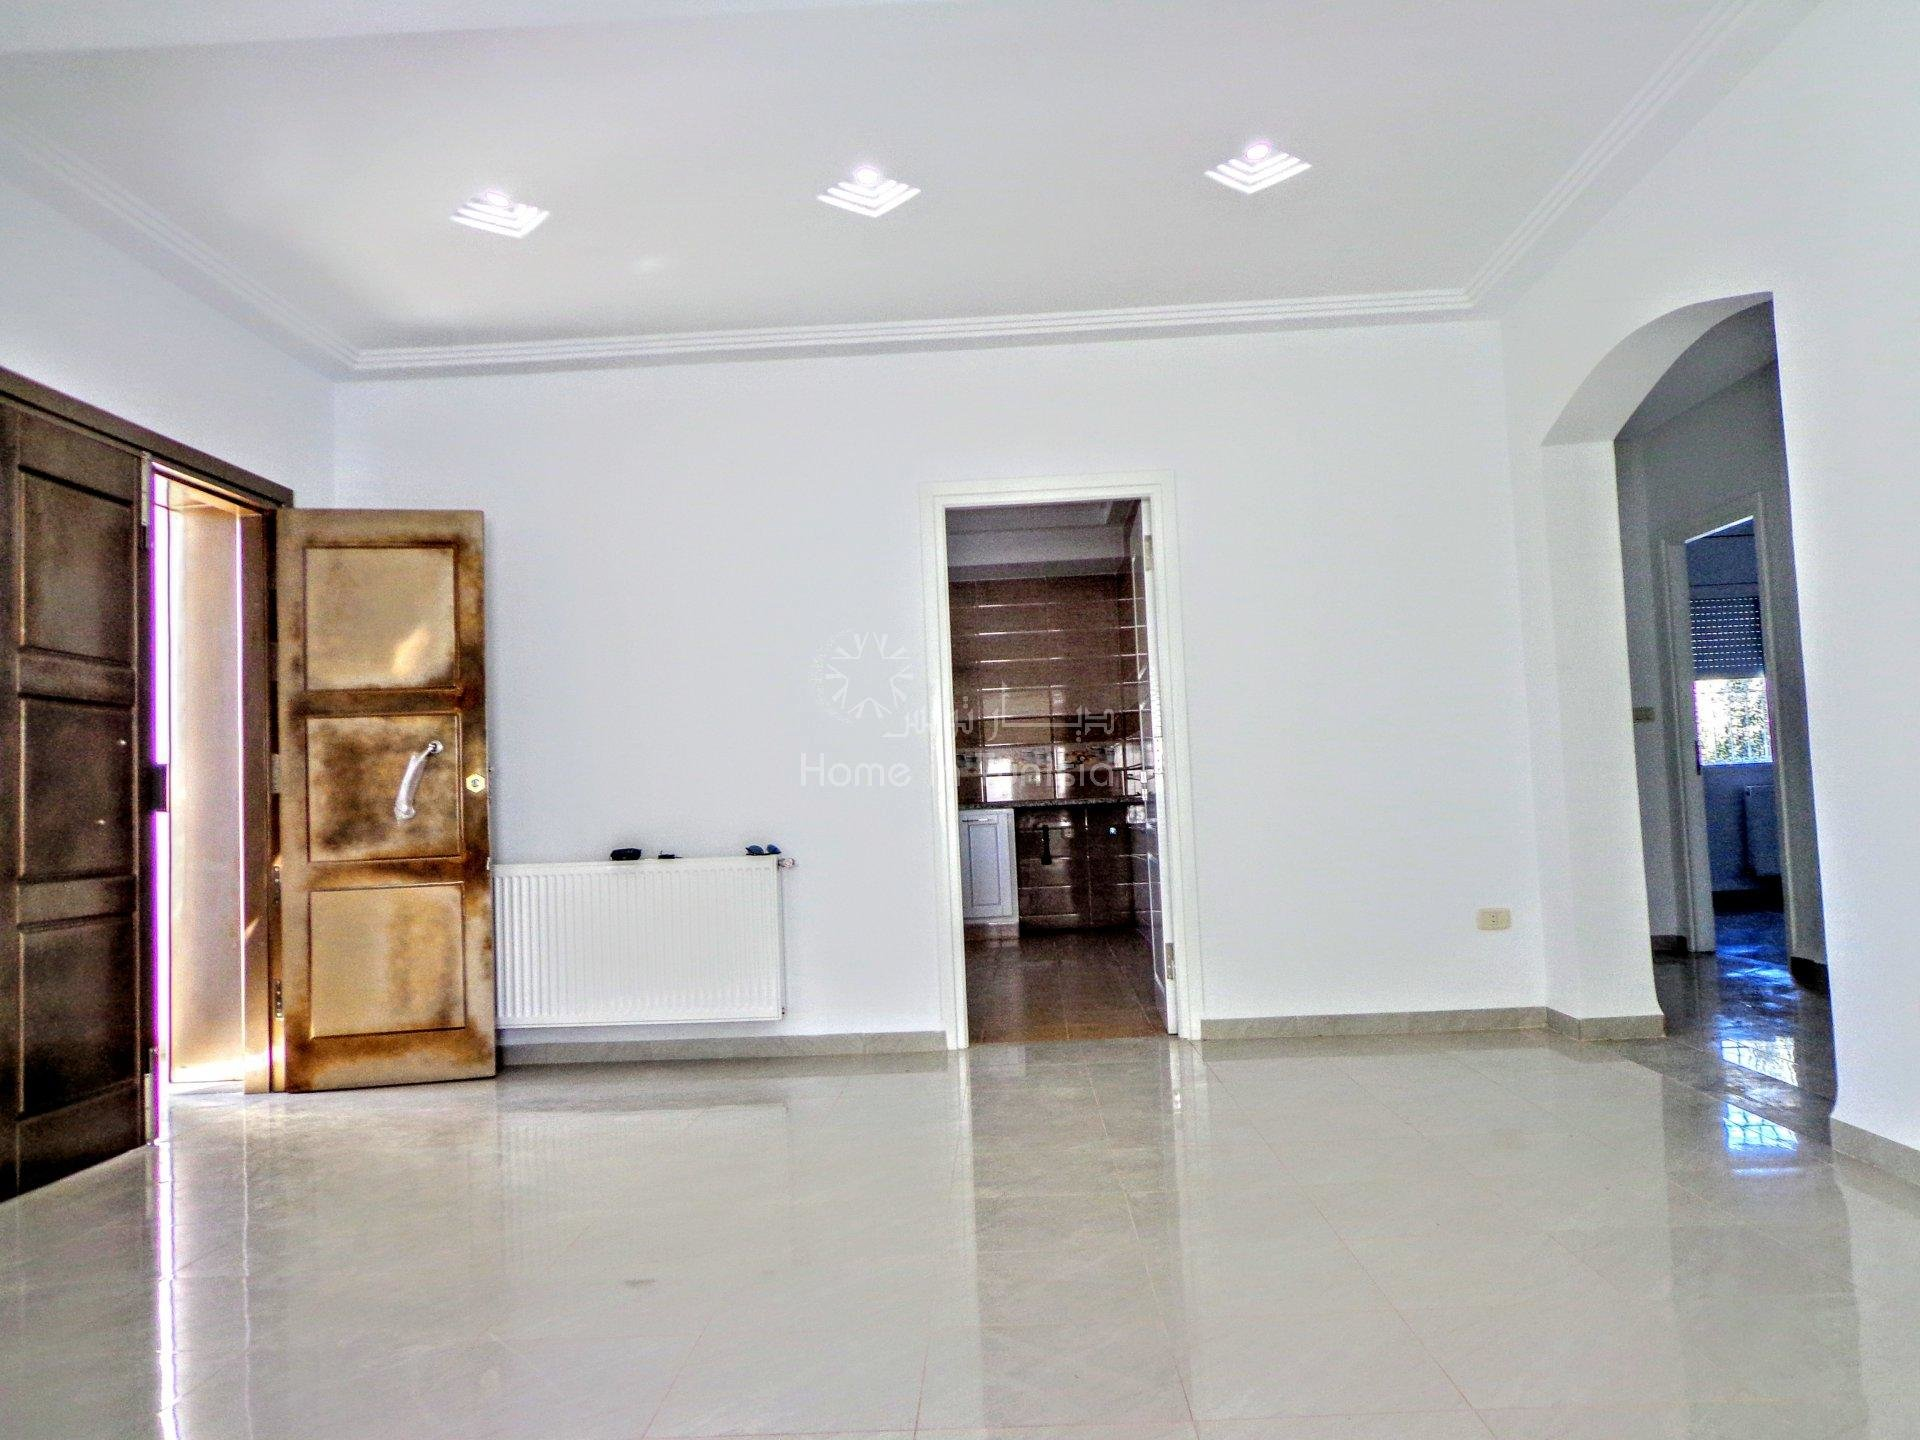 Appartement a hammamet